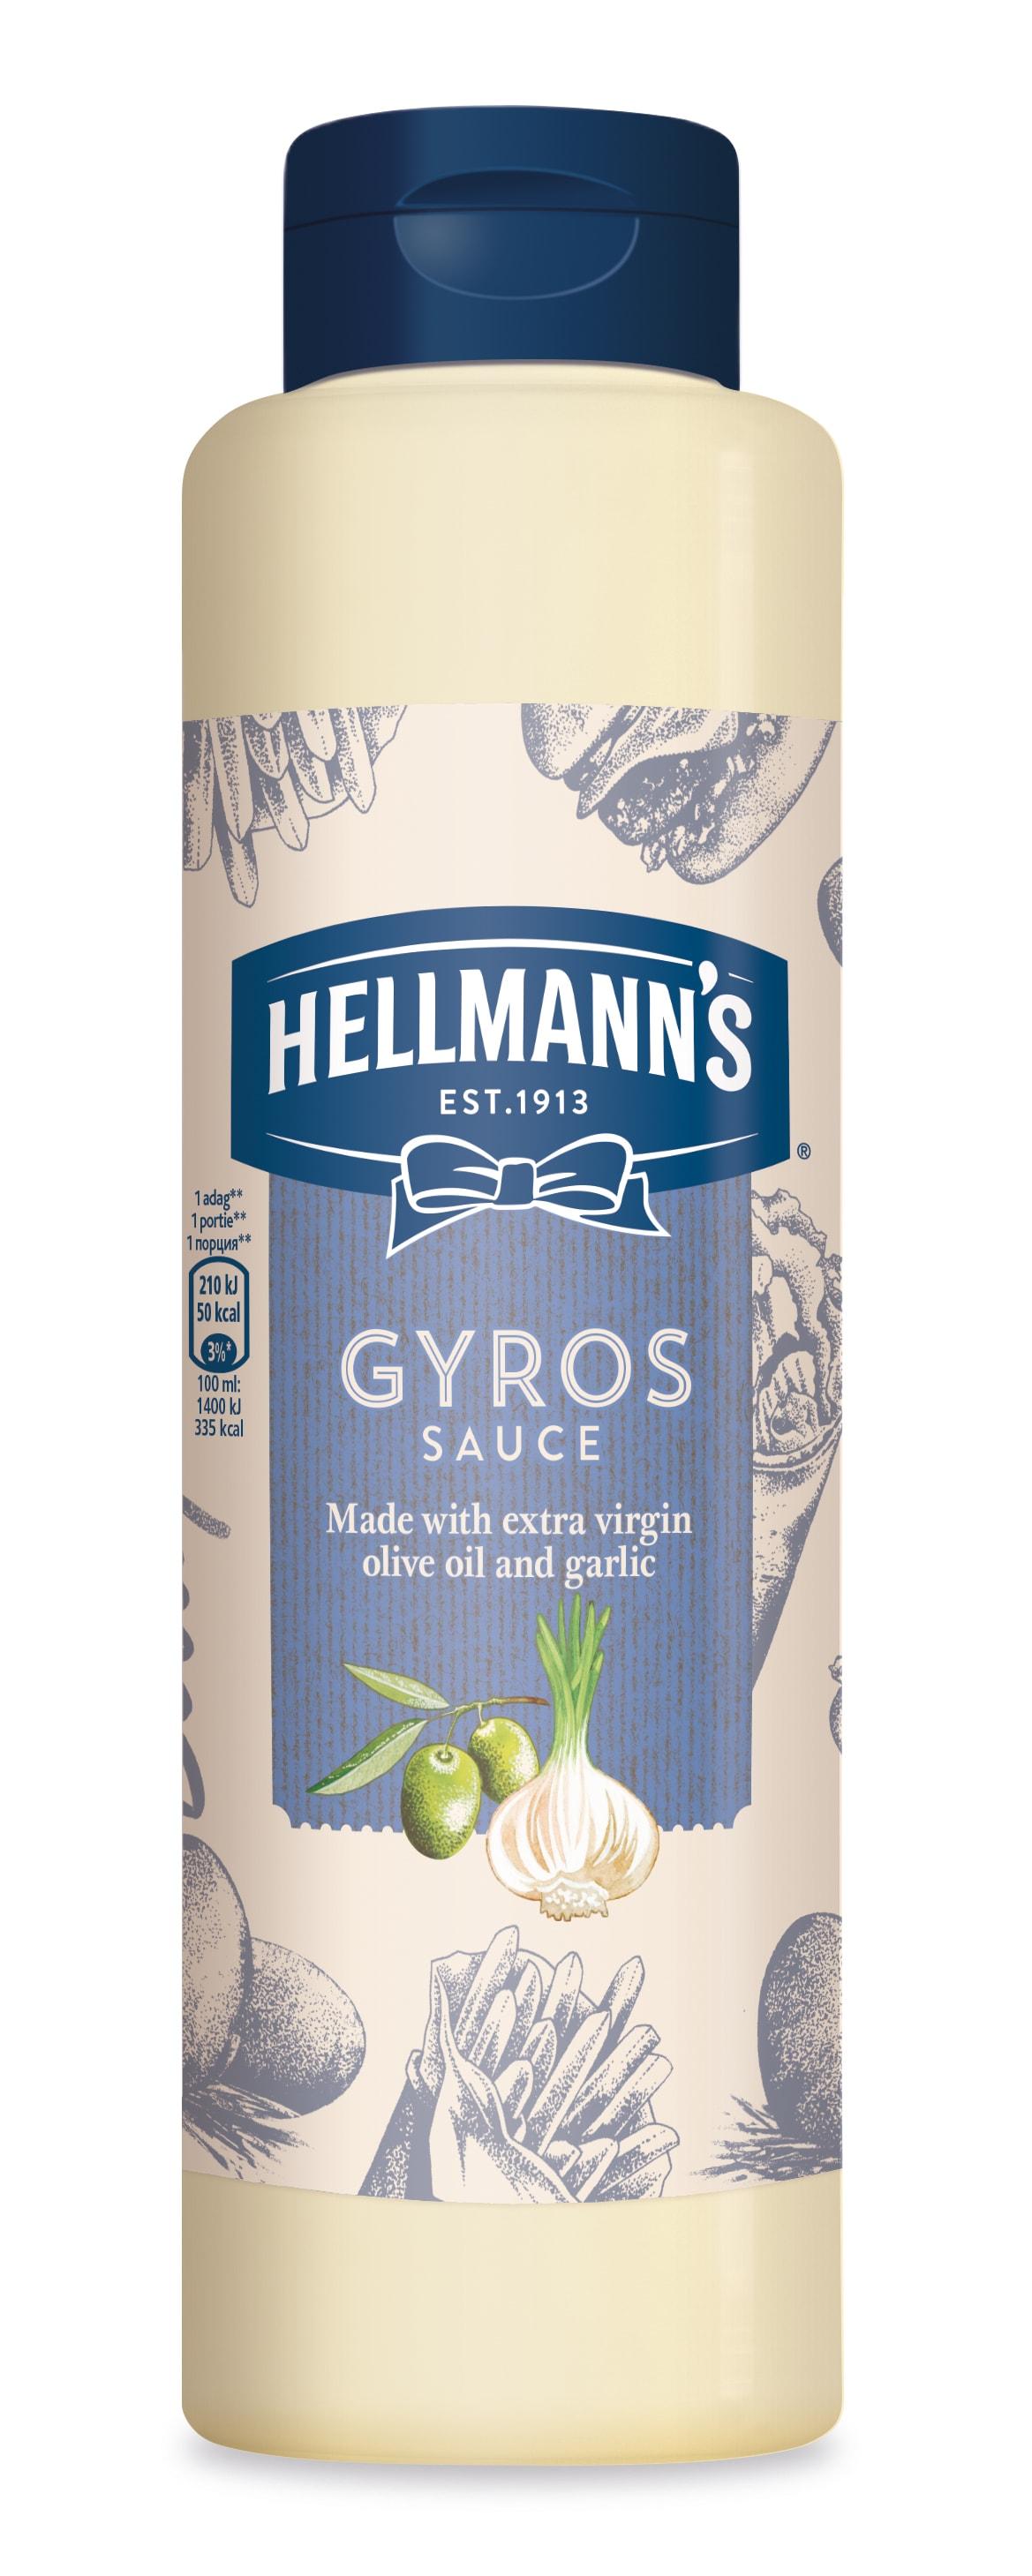 Hellmann's Gyros umak - Umak s ekstra djevičanskim maslinovim uljem i češnjakom 850 ml